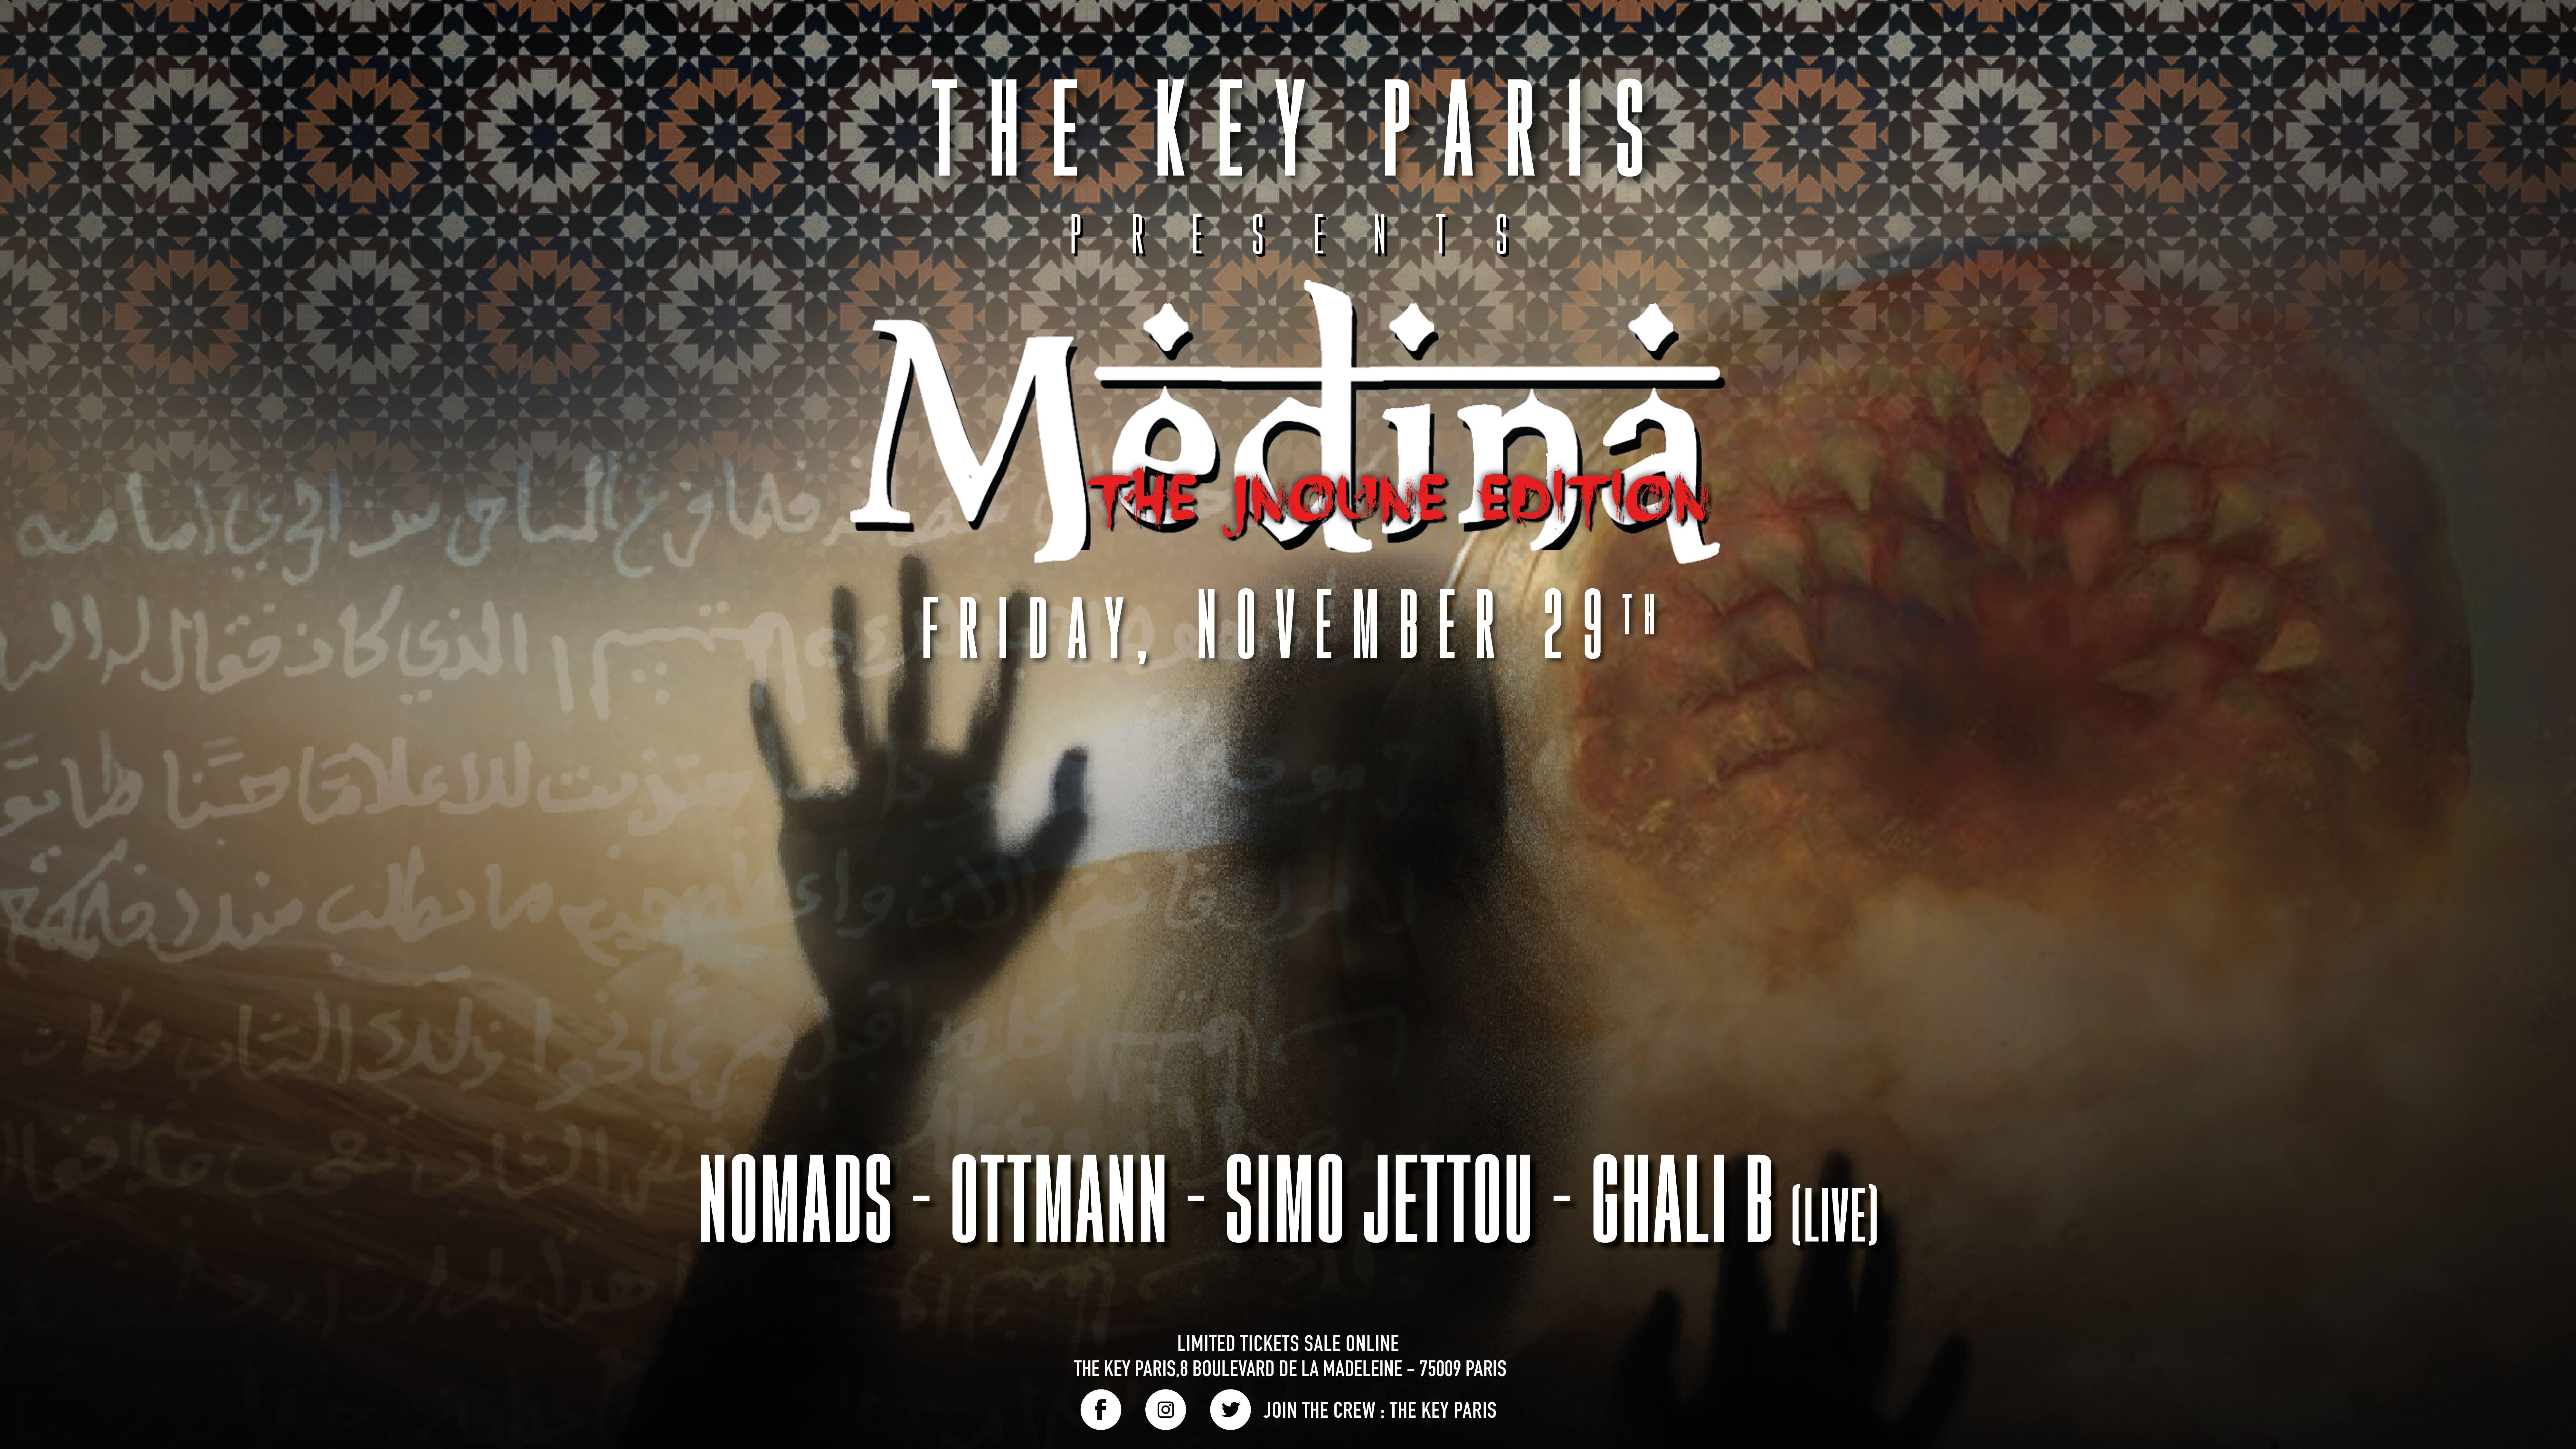 The Key Paris presents : Medina (The Jnoune Edition)